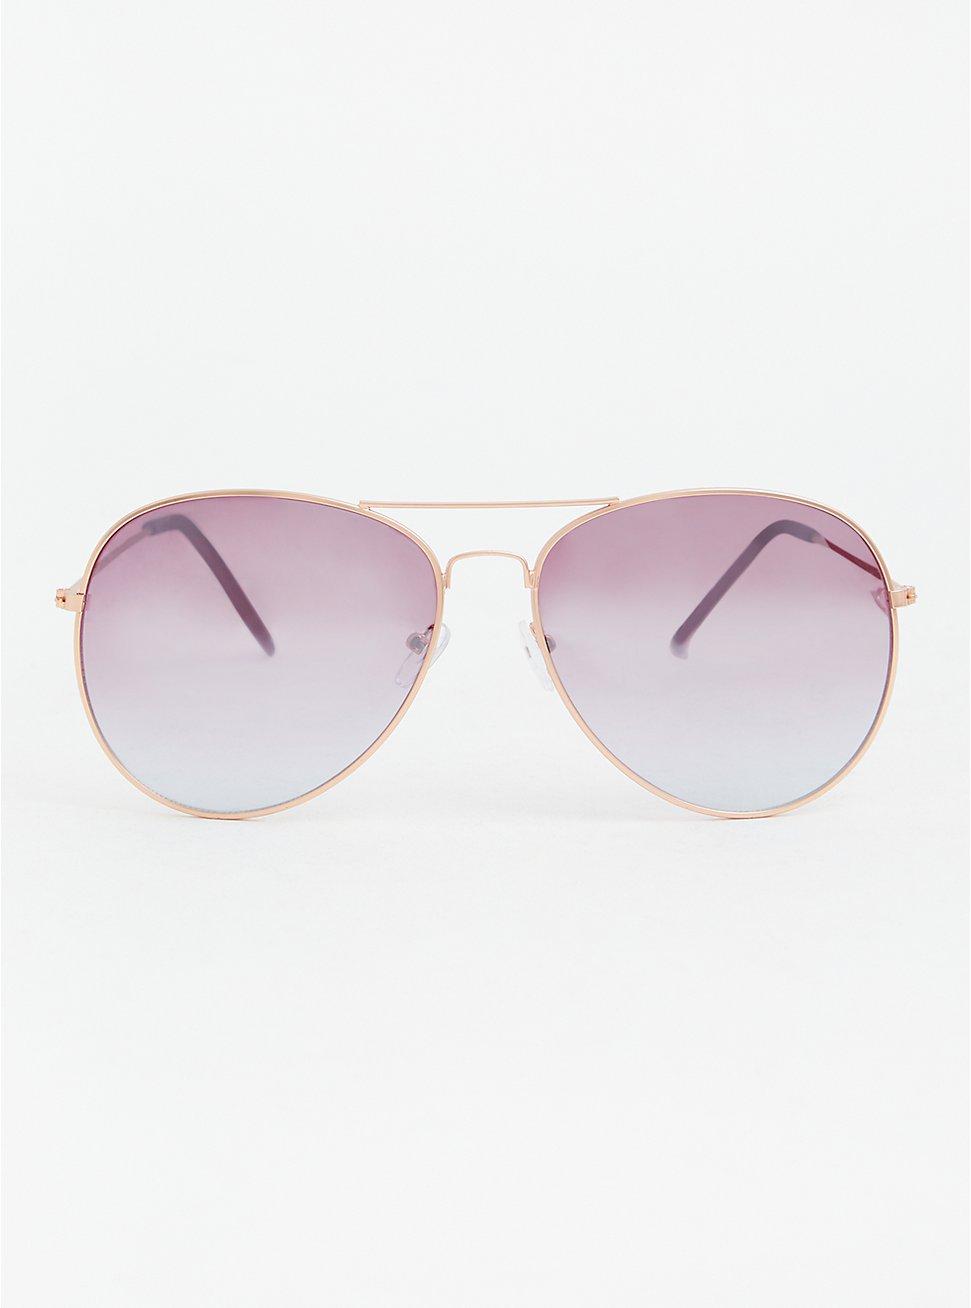 Rose Gold-Tone & Purple-Tinted Aviator Sunglasses, , hi-res